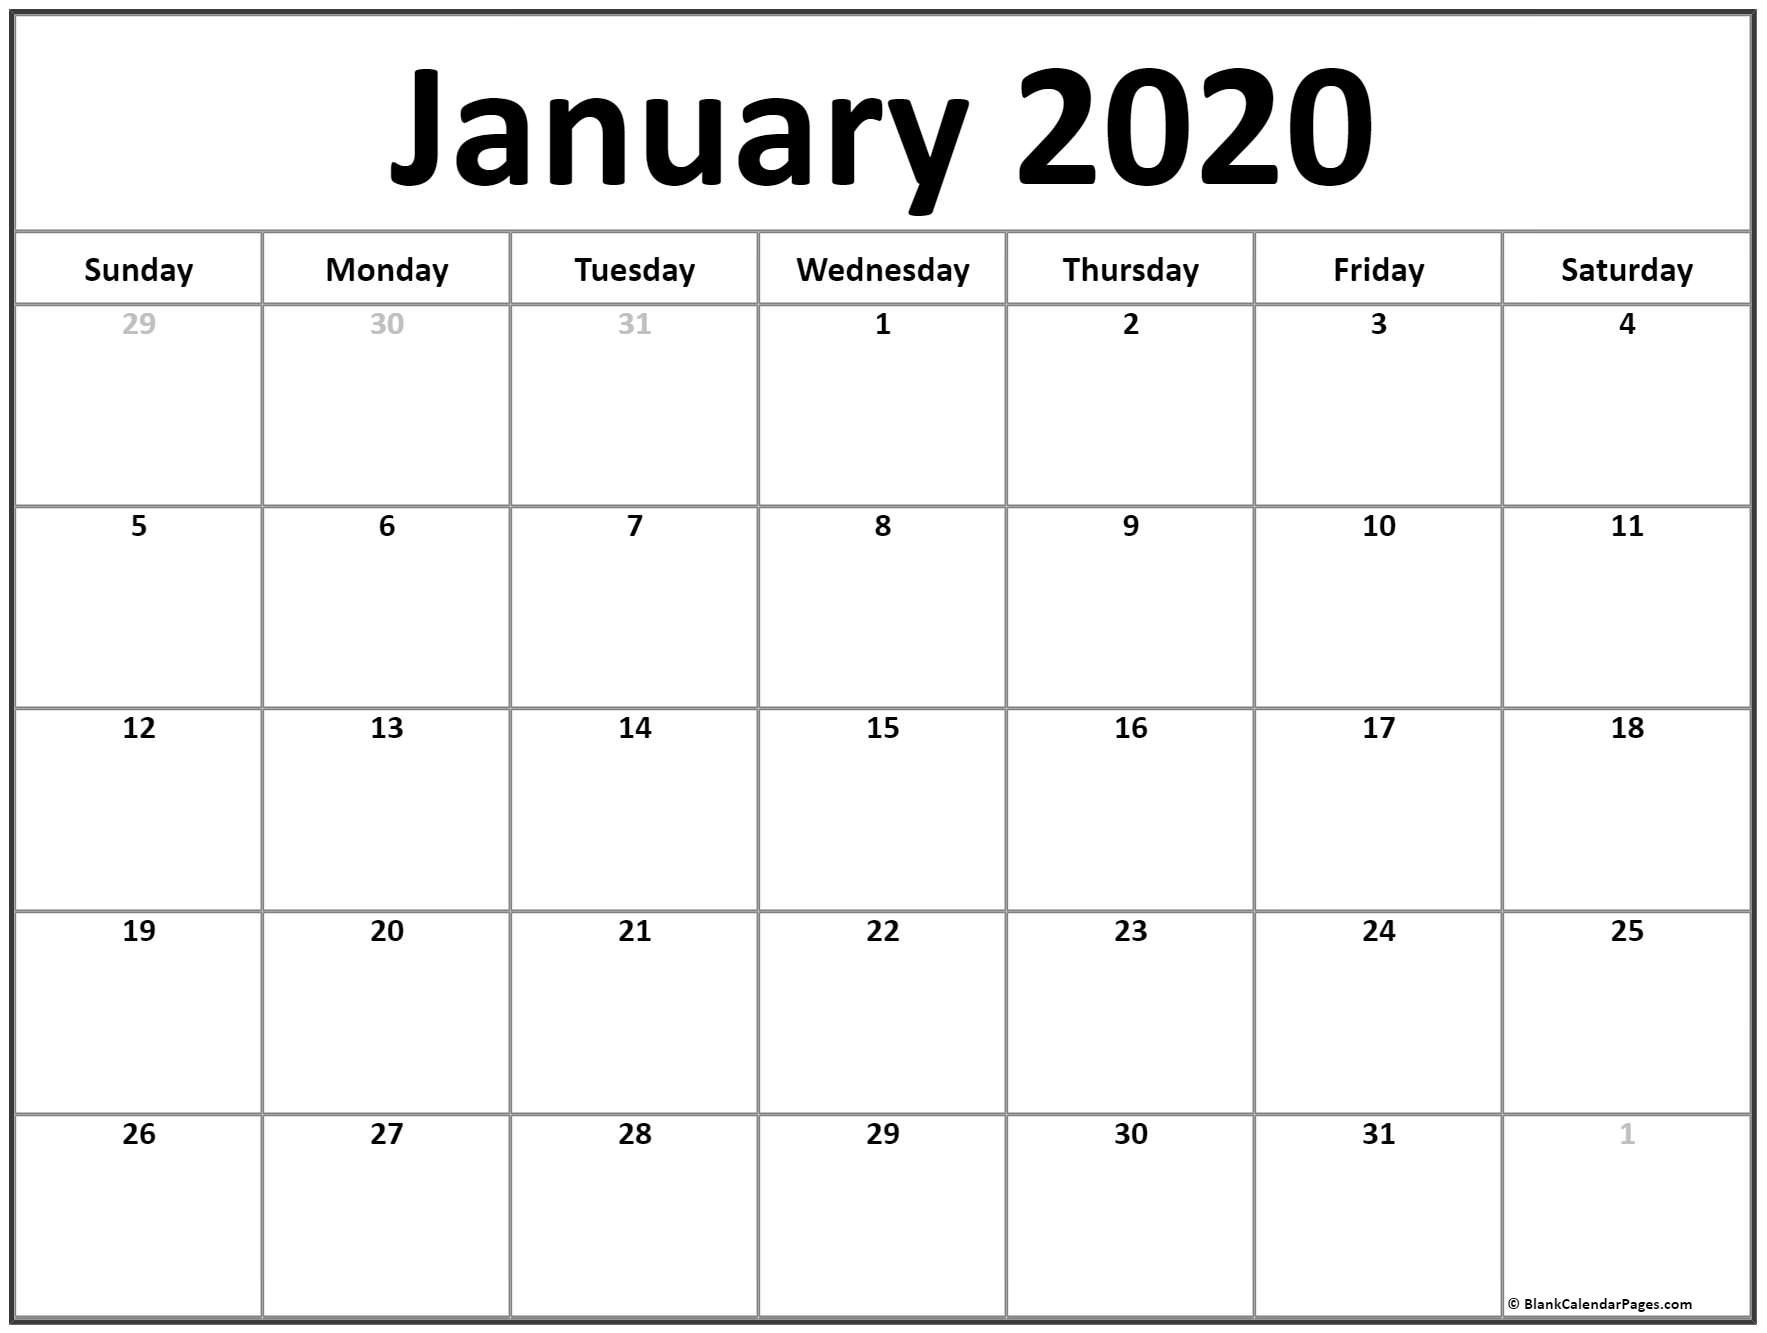 Free Printable Calendar 8.5 X 11 | Month Calendar Printable 8X11 Sie Free April Calander